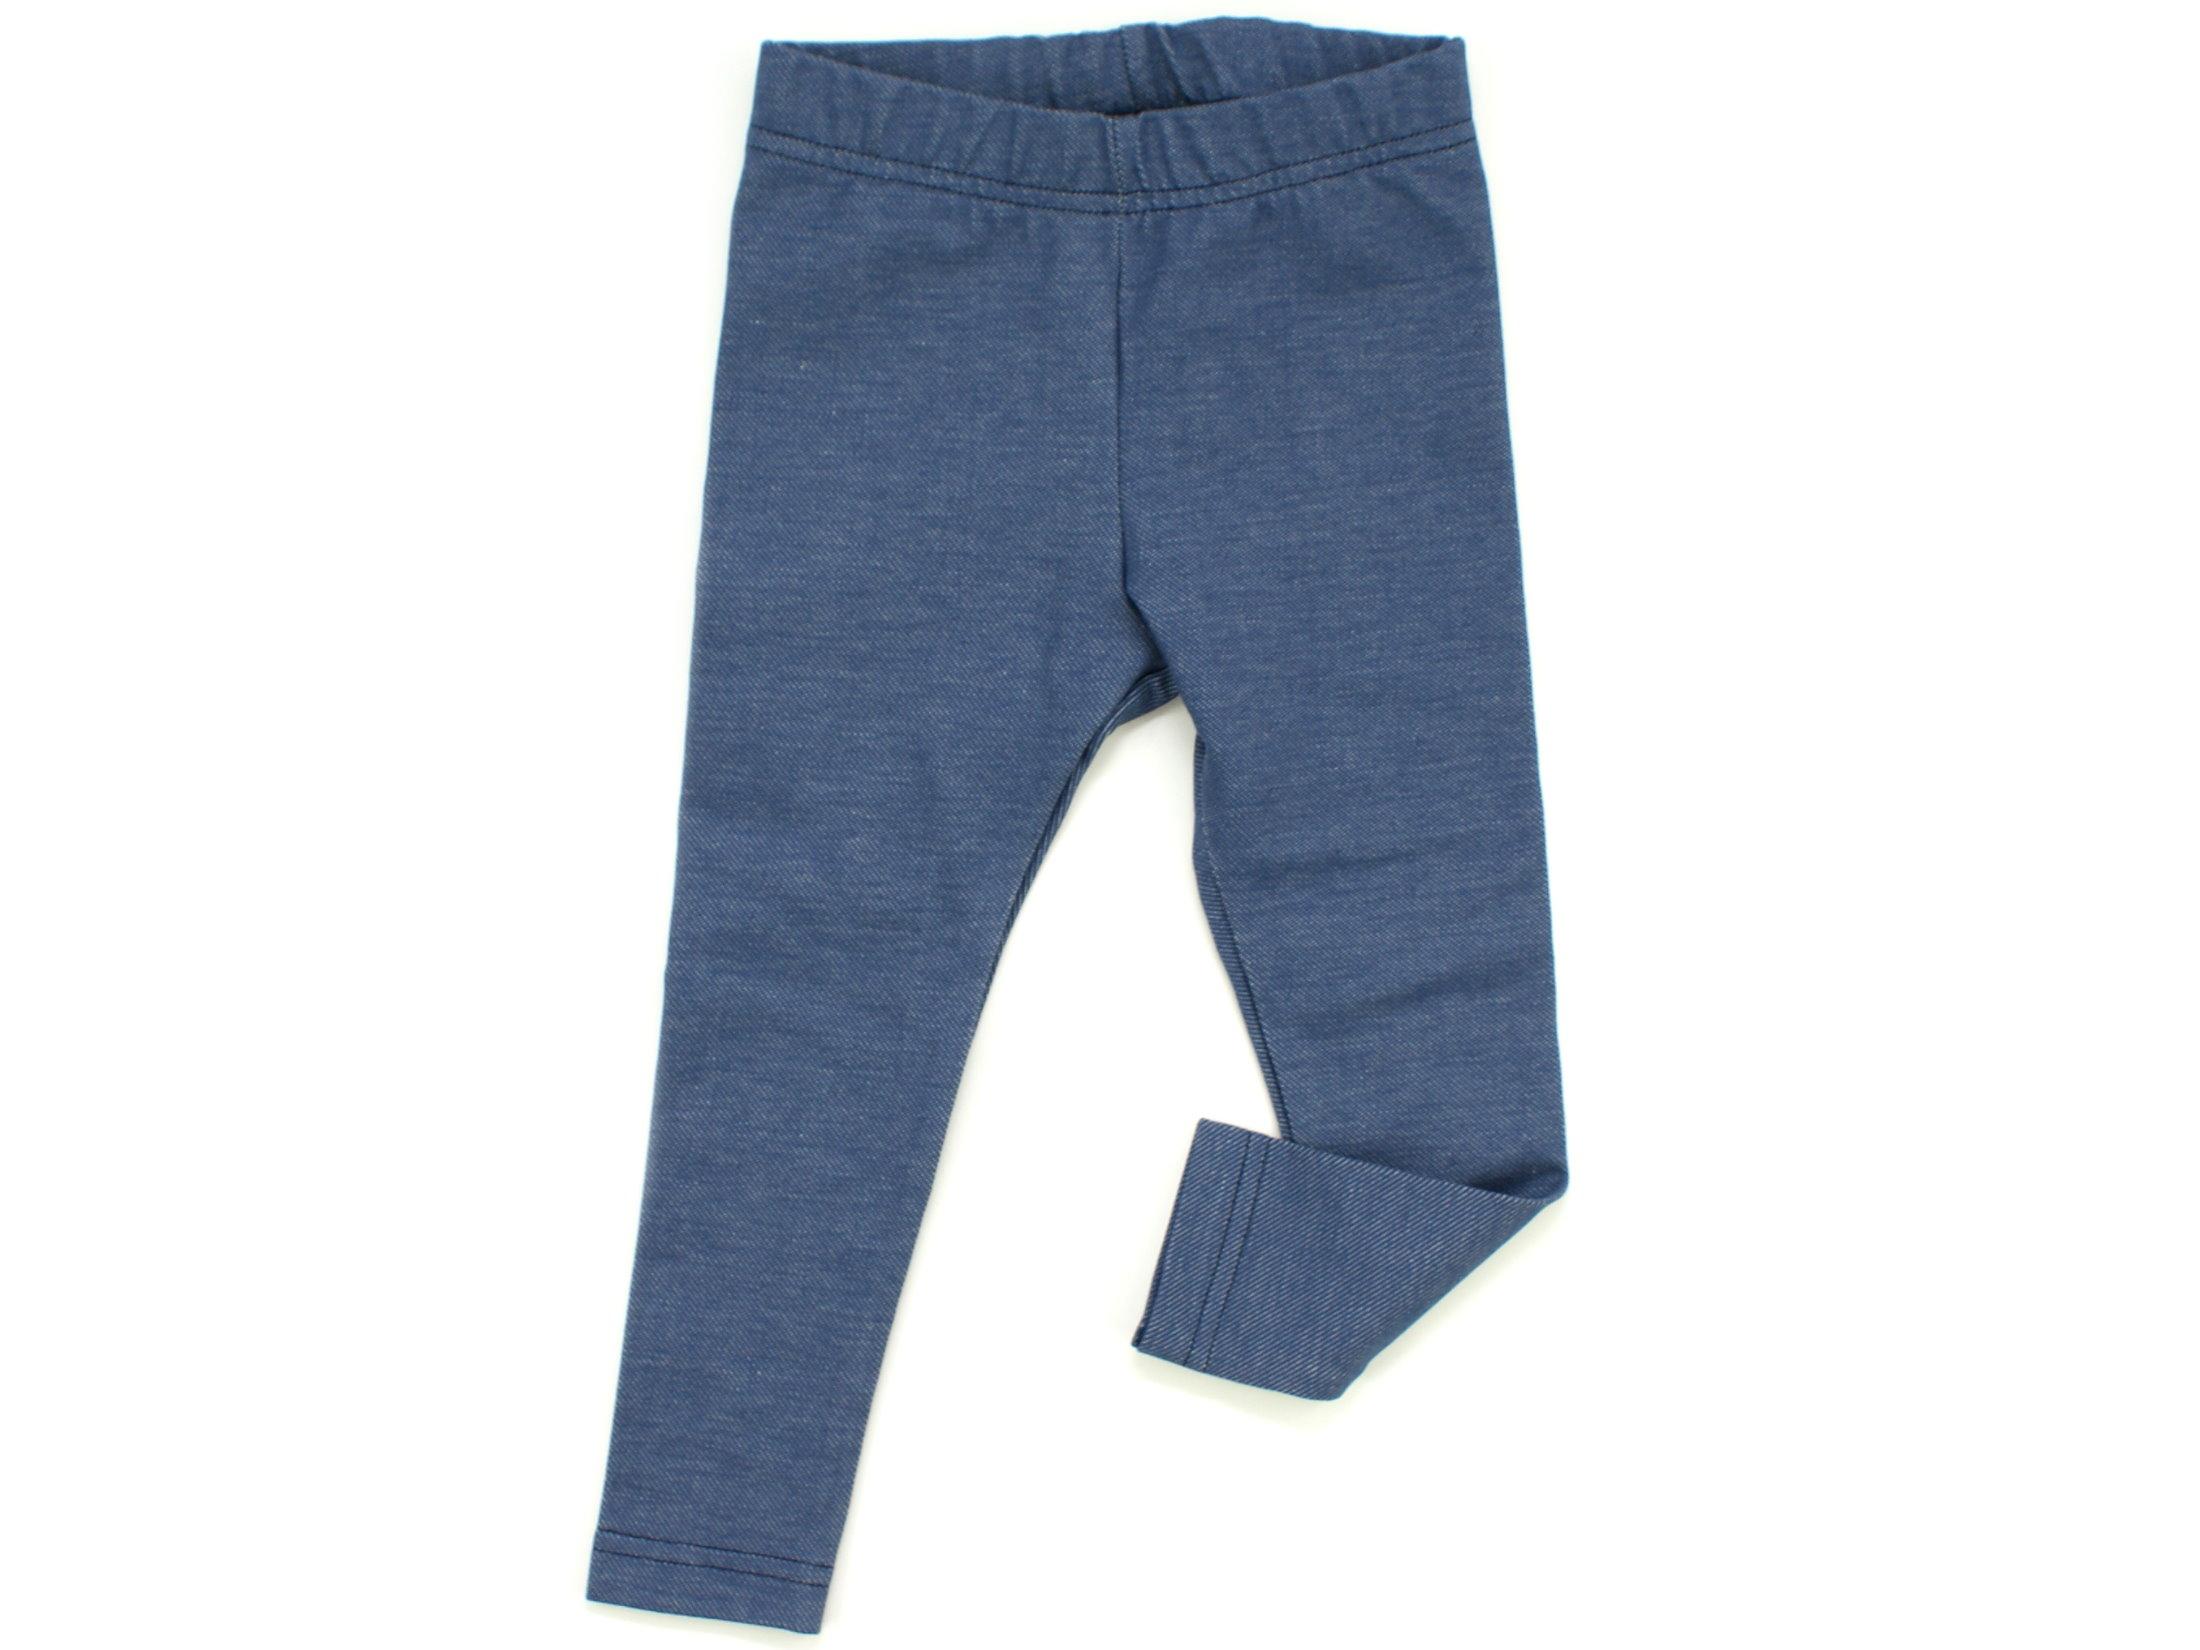 Kinder Leggings Jeansjersy blau